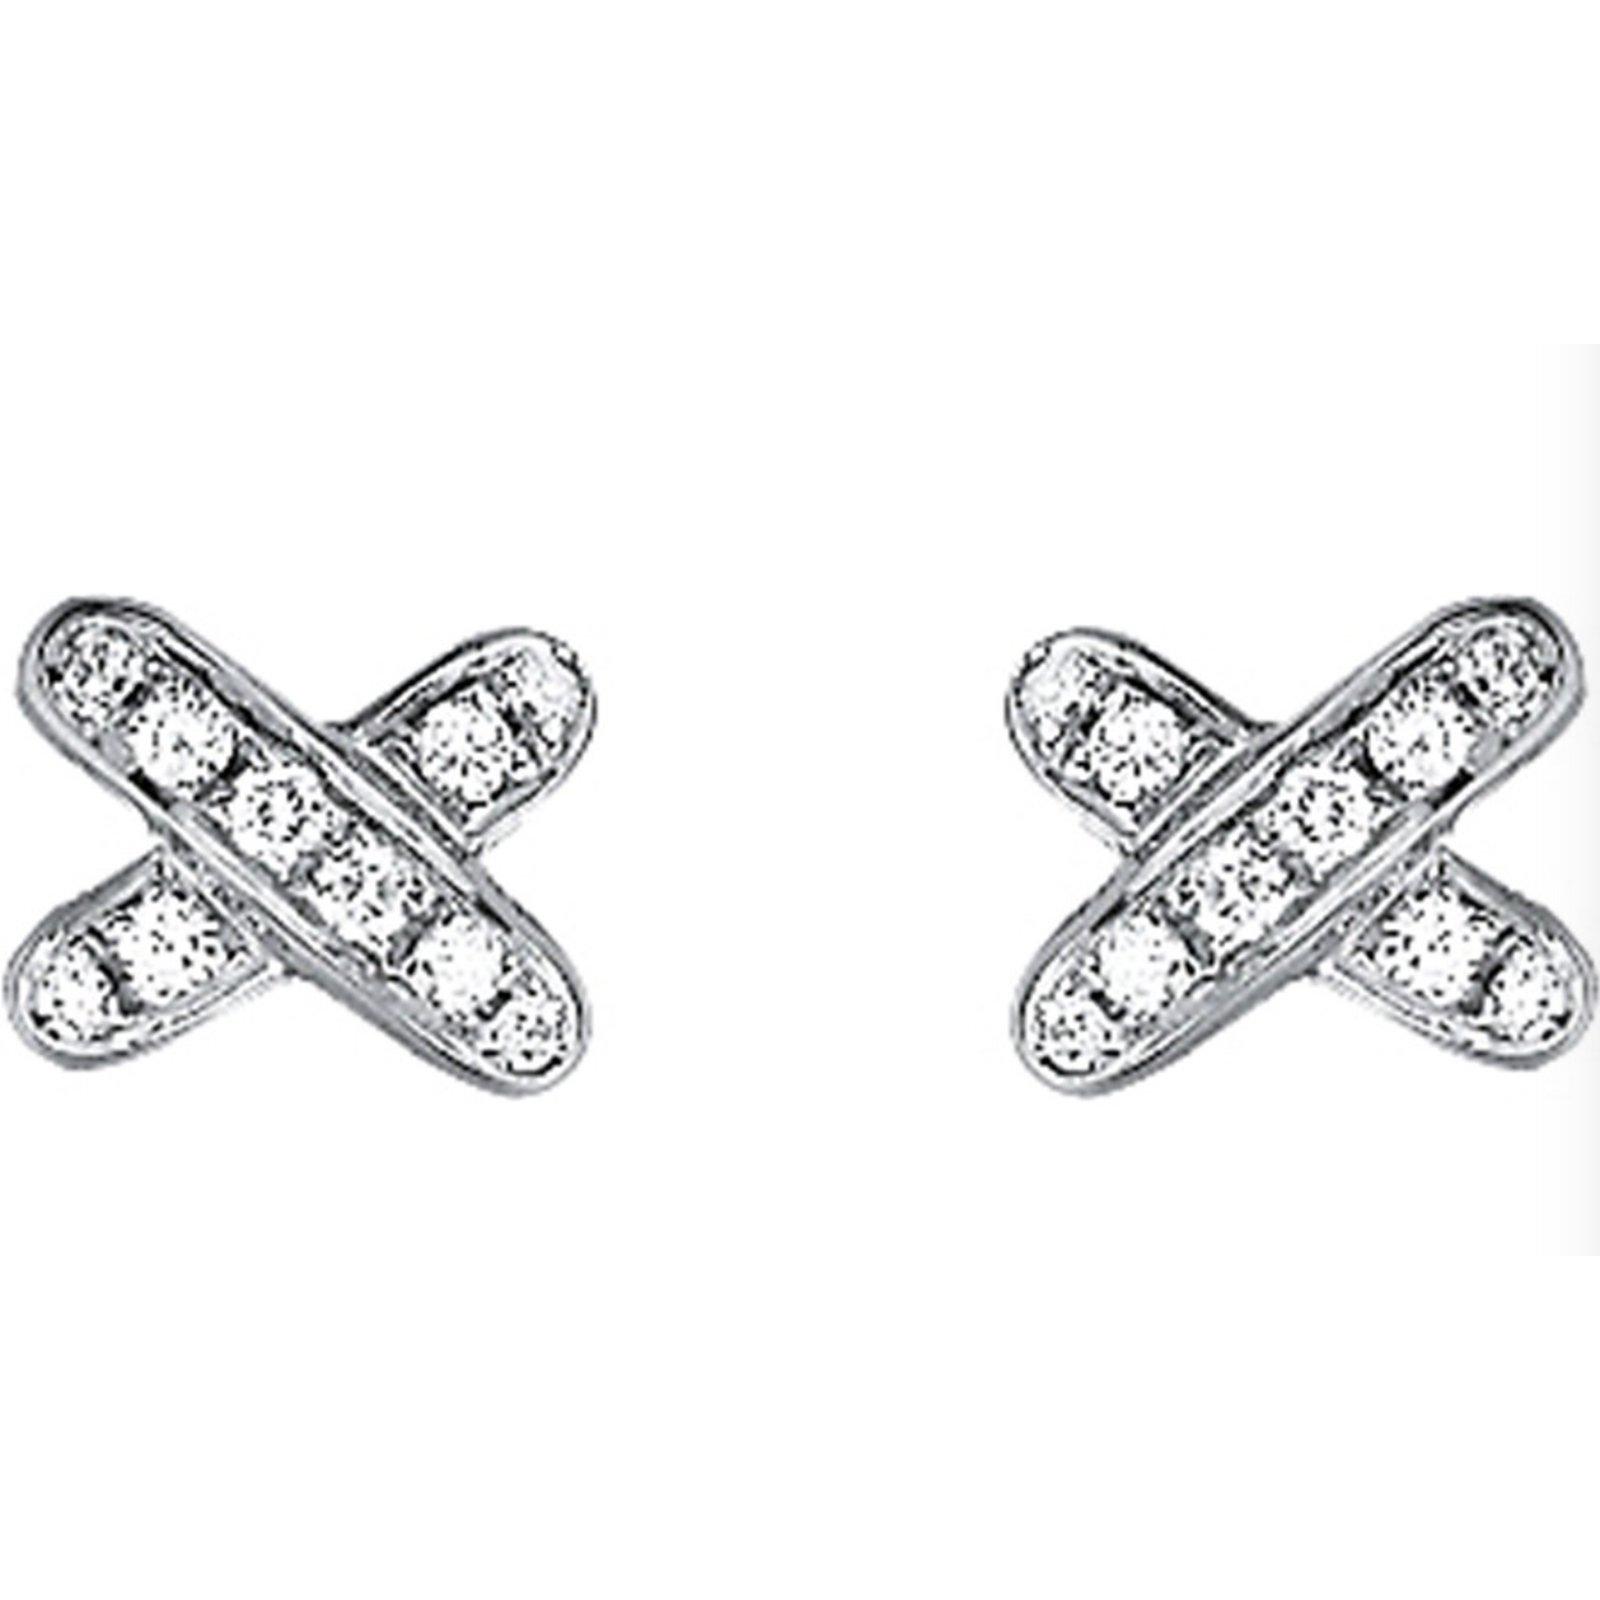 Chaumet Liens Croisés Earrings White Gold Silvery Ref 53039